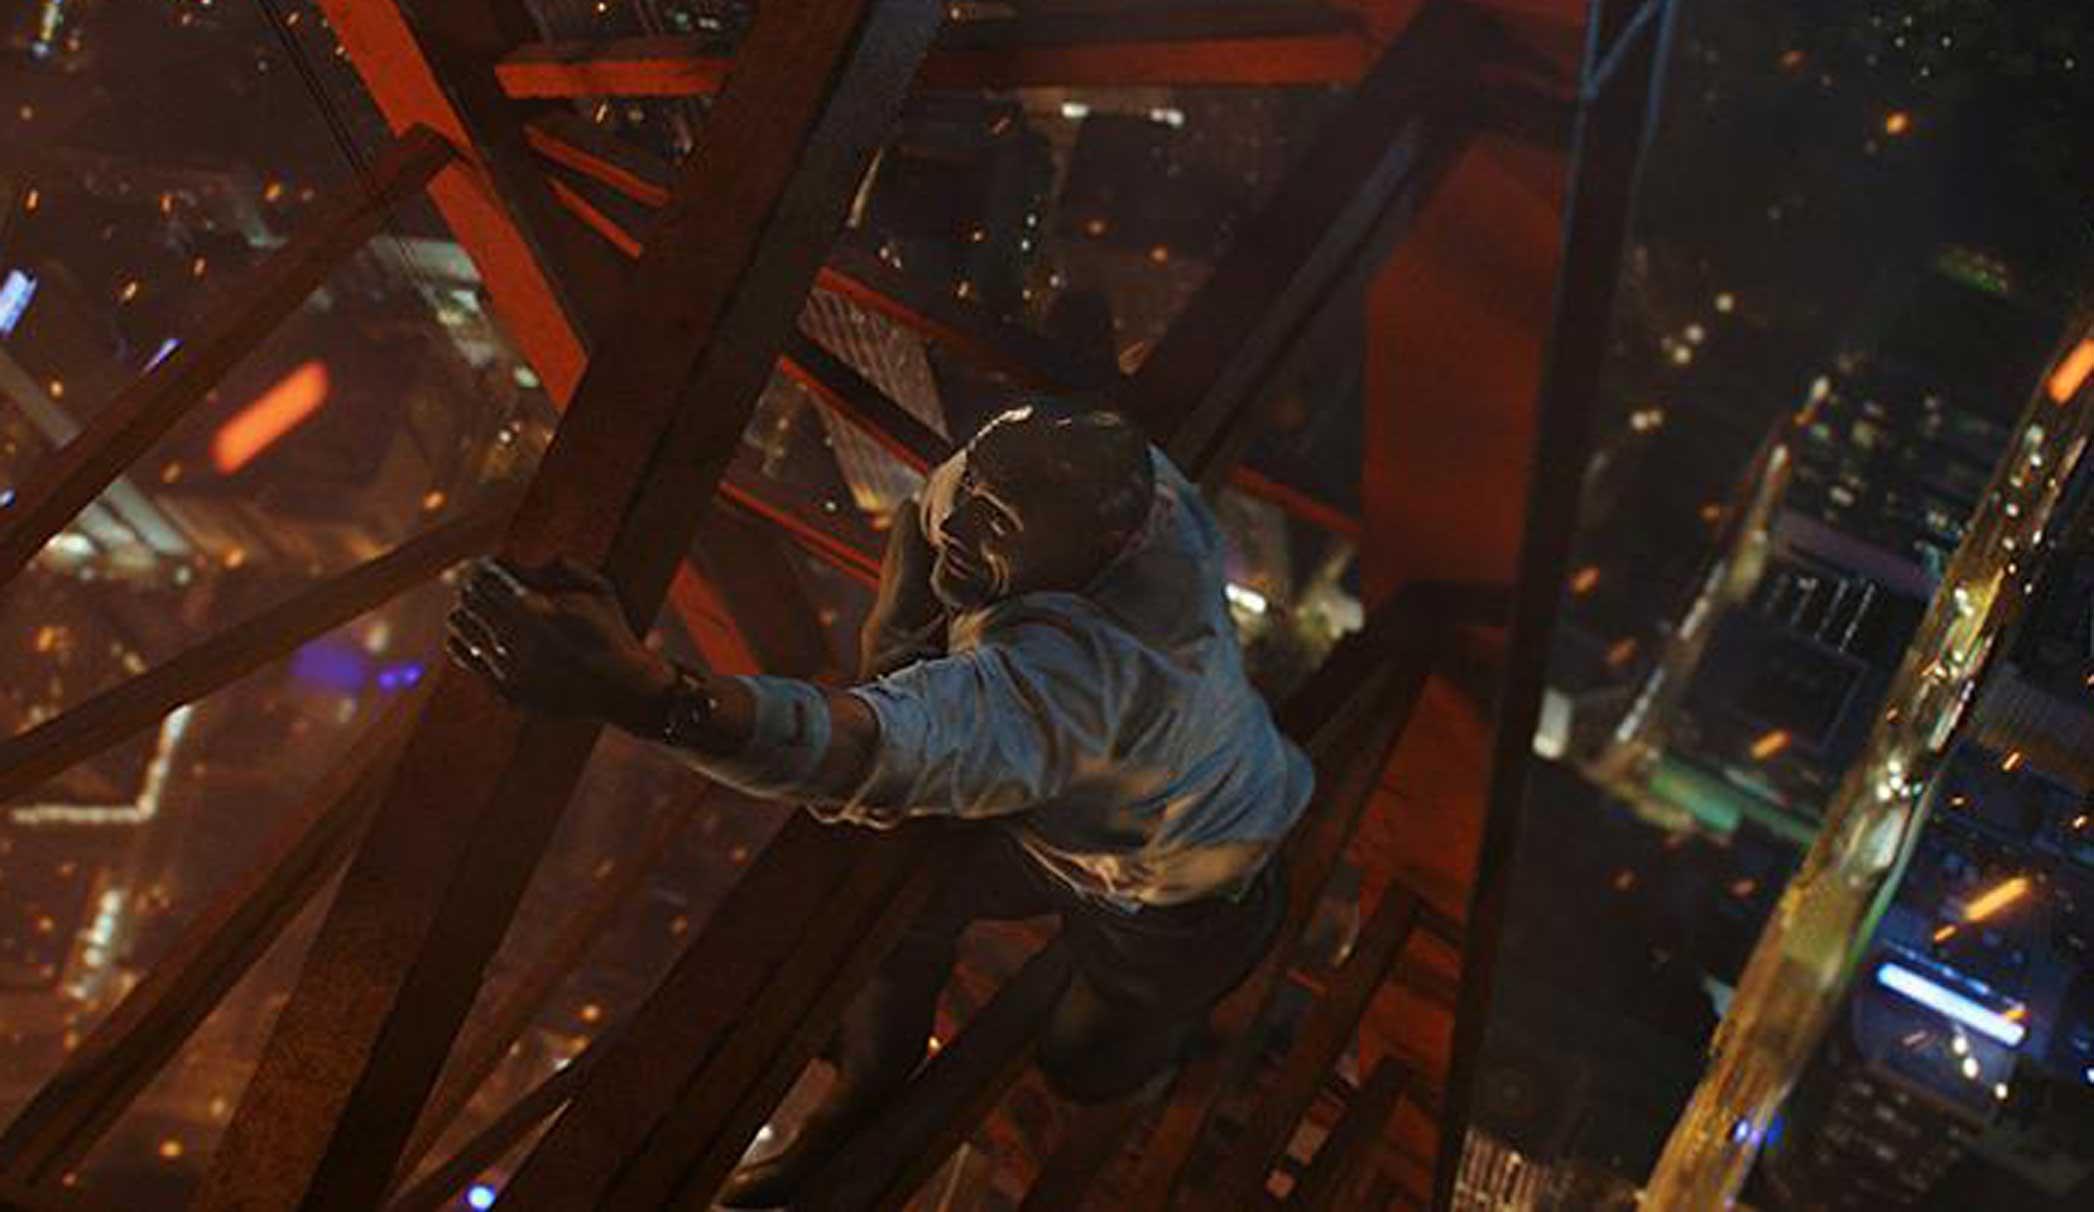 'Skyscraper' Final Trailer Is Just Dwayne Johnson Doing Dwayne Johnson Things